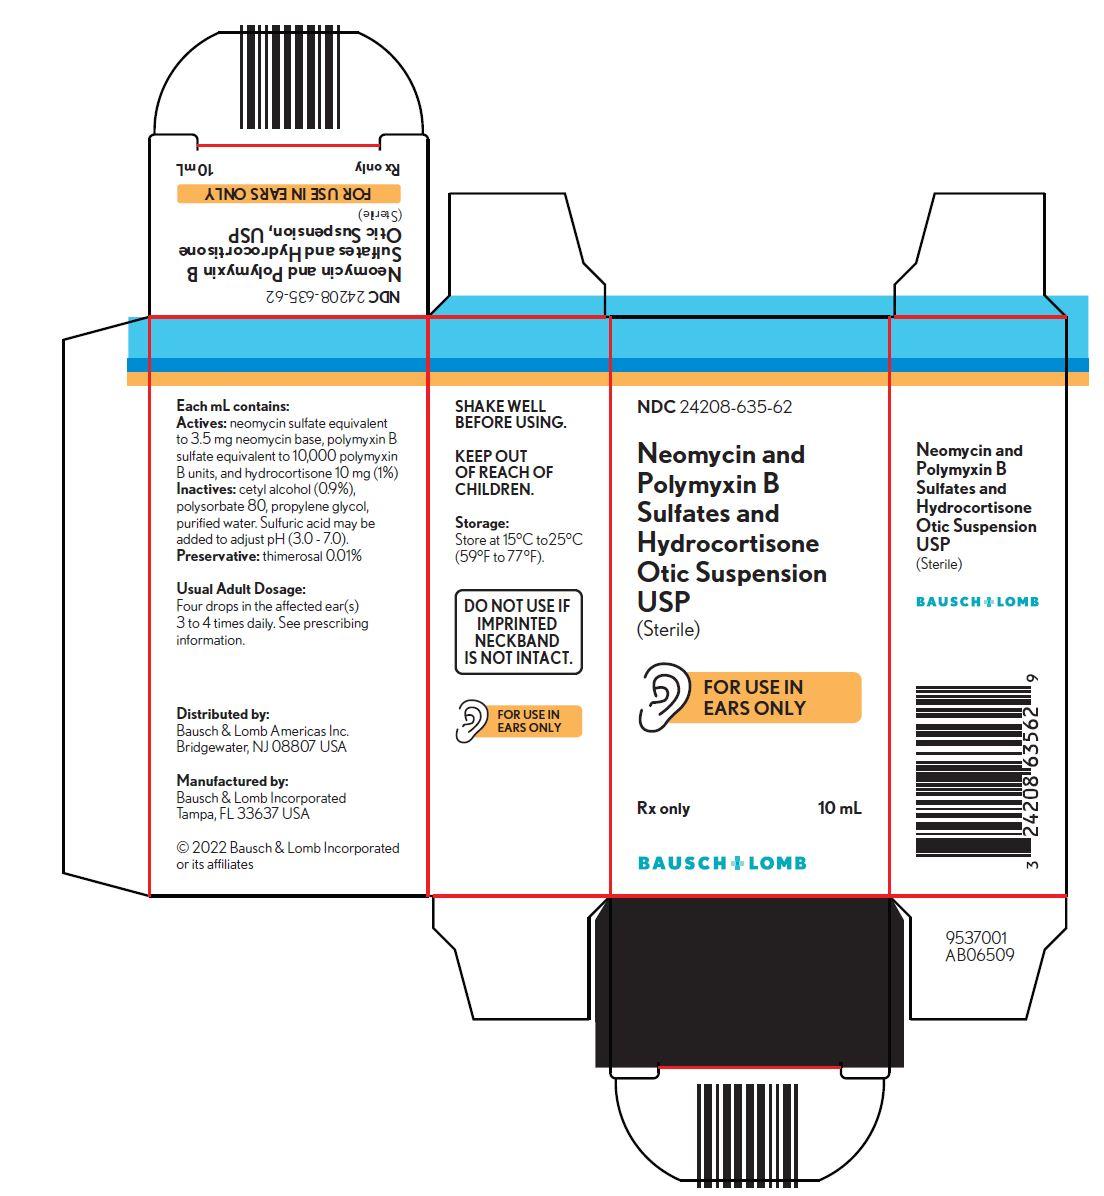 Carton-10mL.jpg